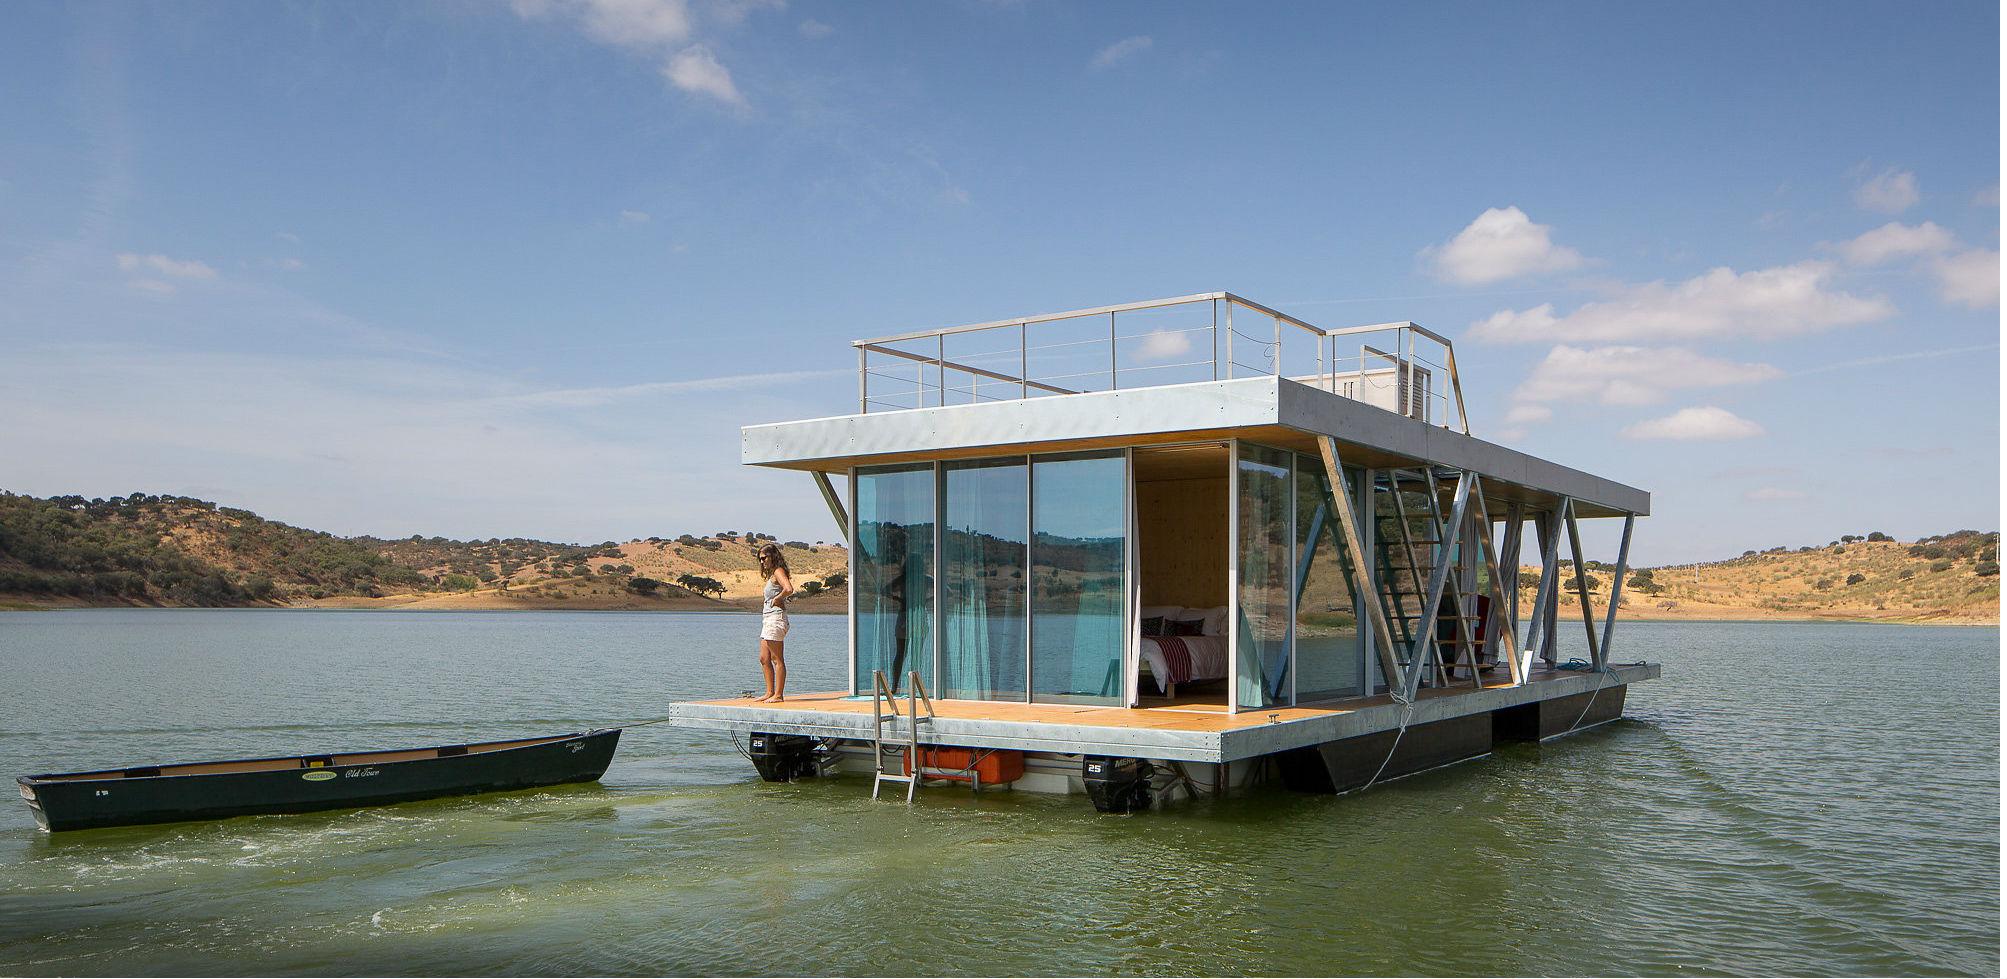 La casa de lujo flotante en Portugal